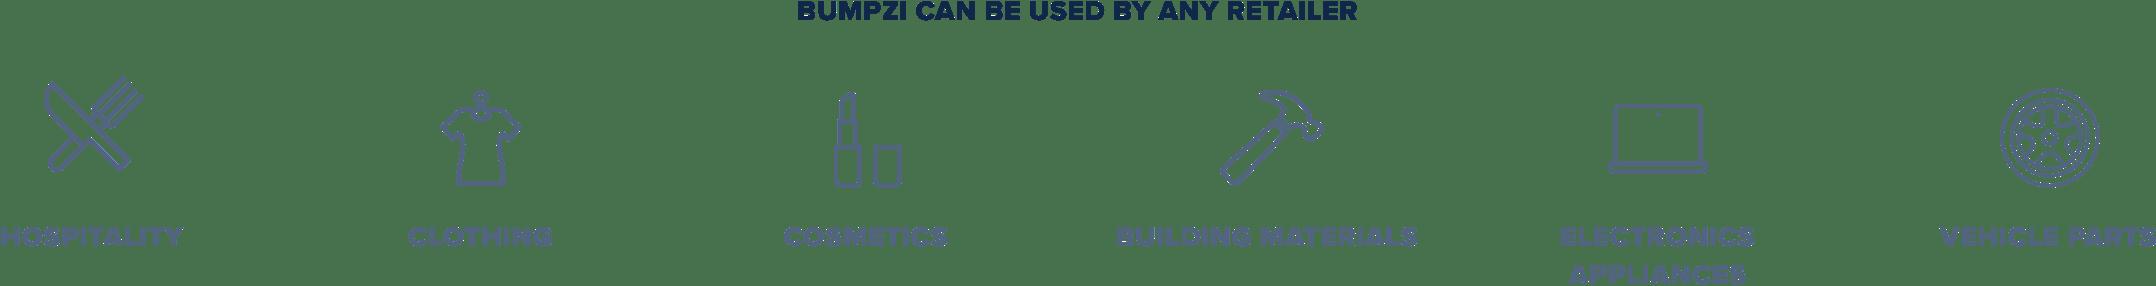 Custom Icons - Bumpzi